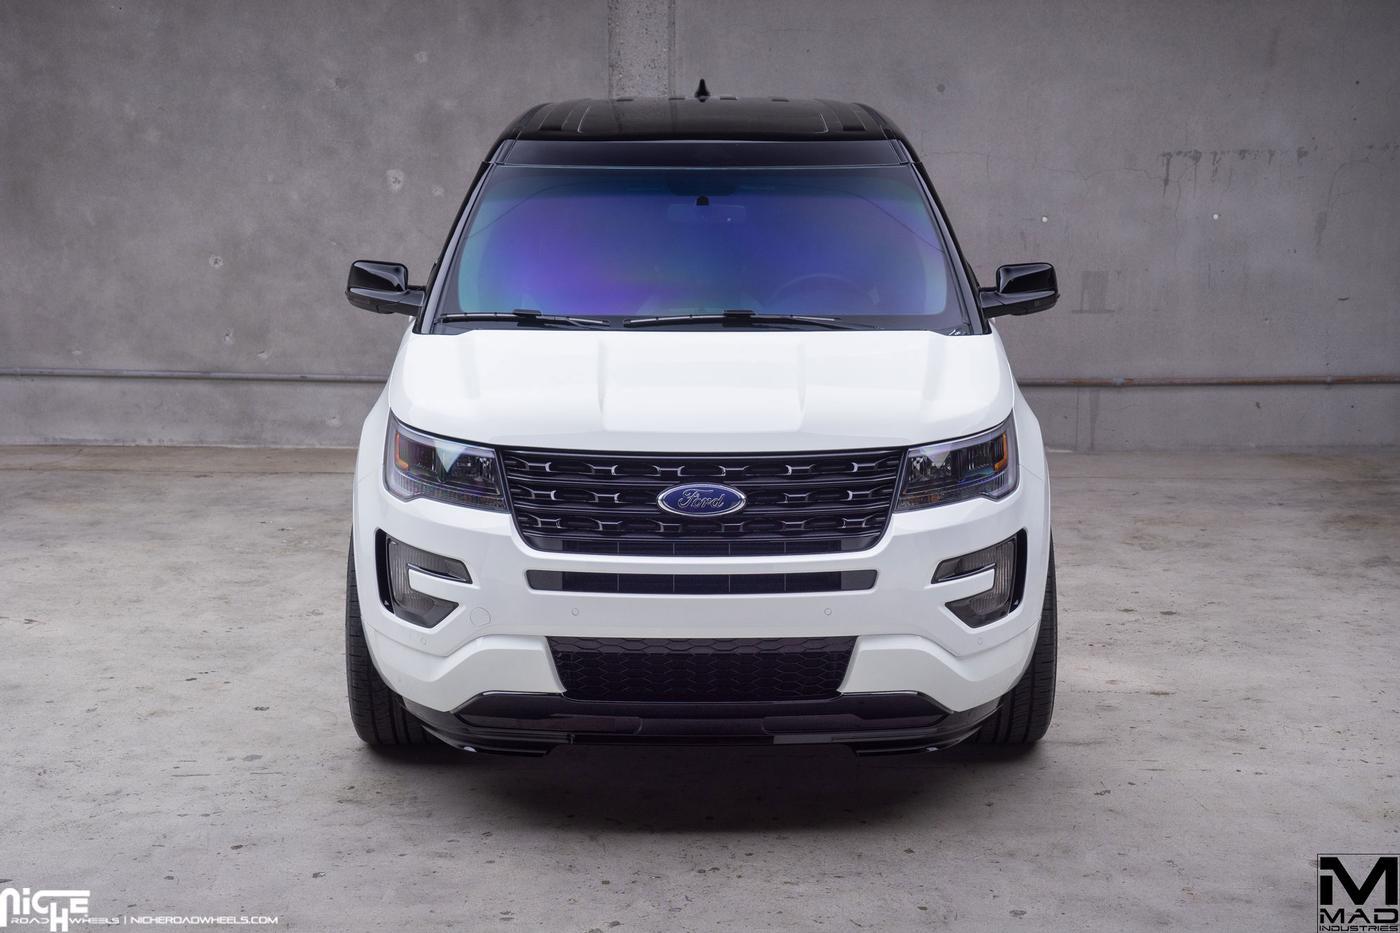 Custom Ford Explorer >> 2016 Ford Explorer Mad Industries Niche Alpine Mht Wheels Inc